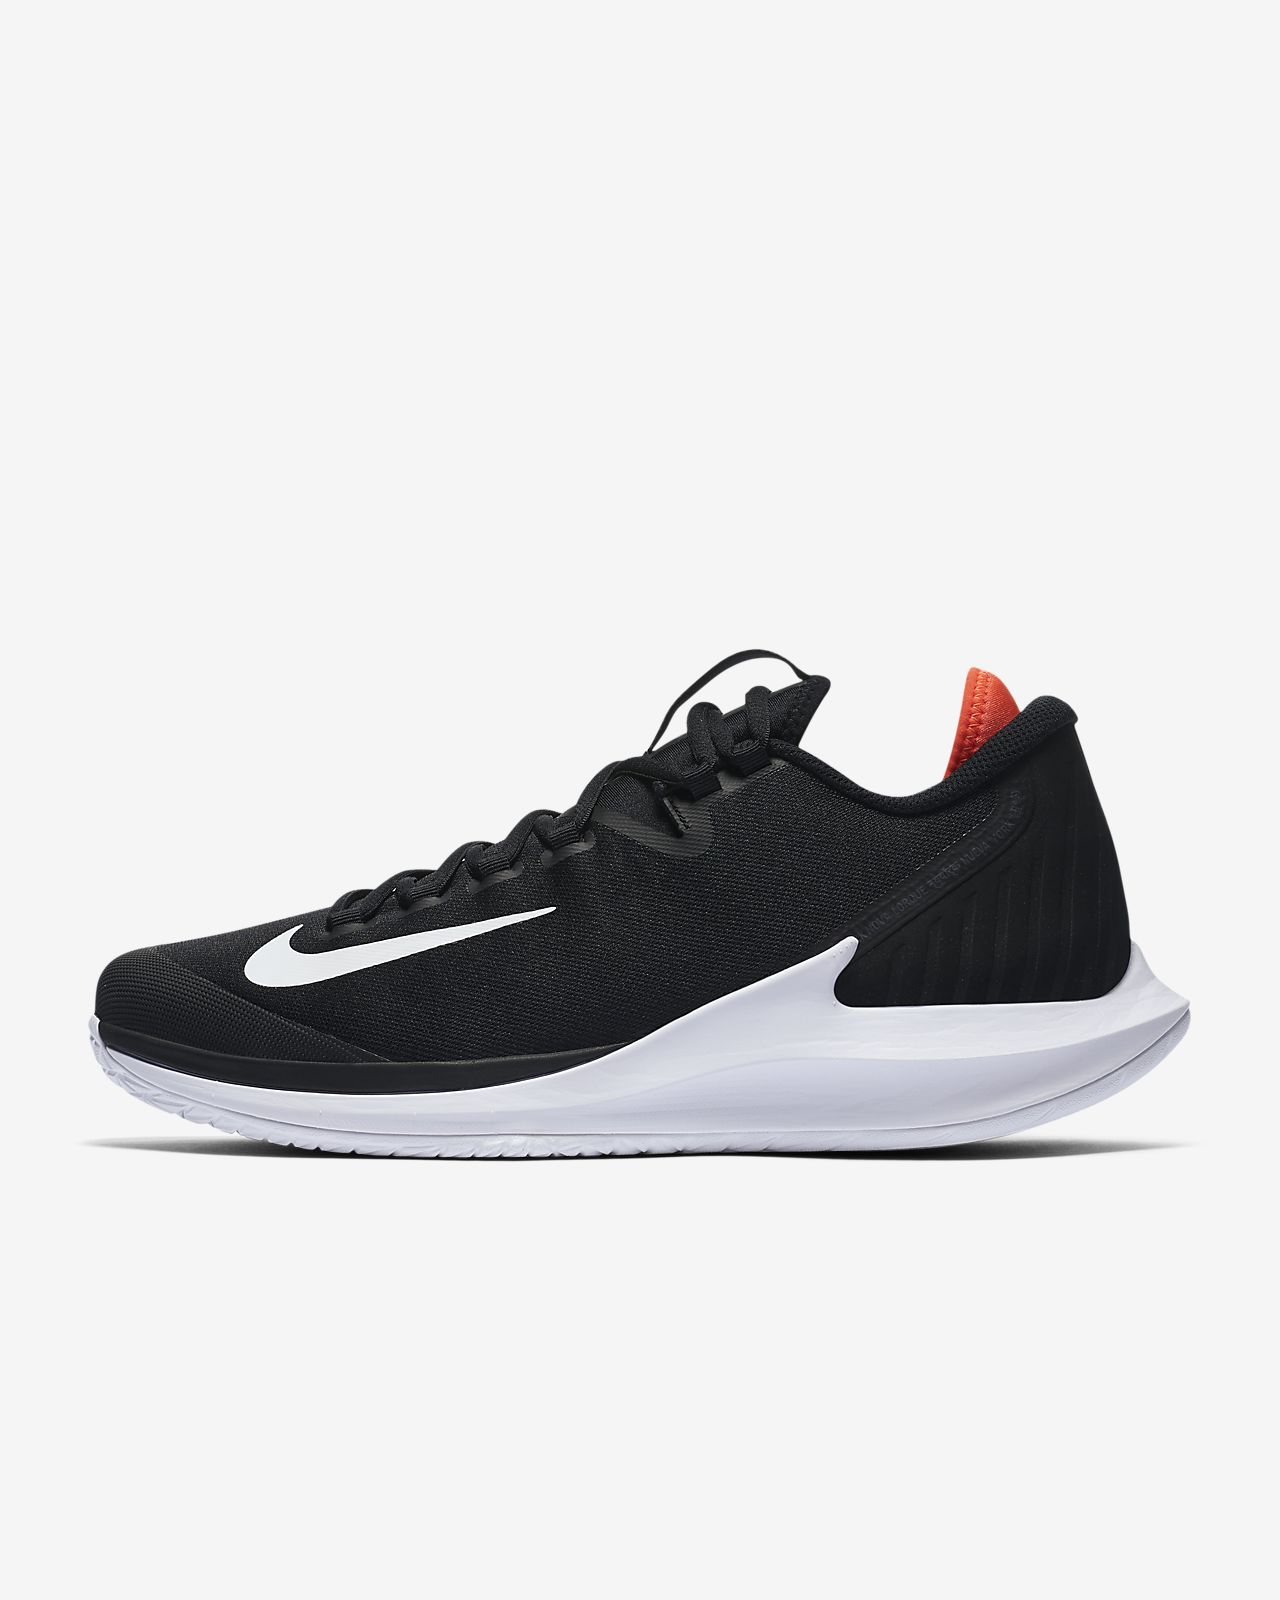 6e13223e43 NikeCourt Air Zoom Zero Men's Hard Court Tennis Shoe. Nike.com NO